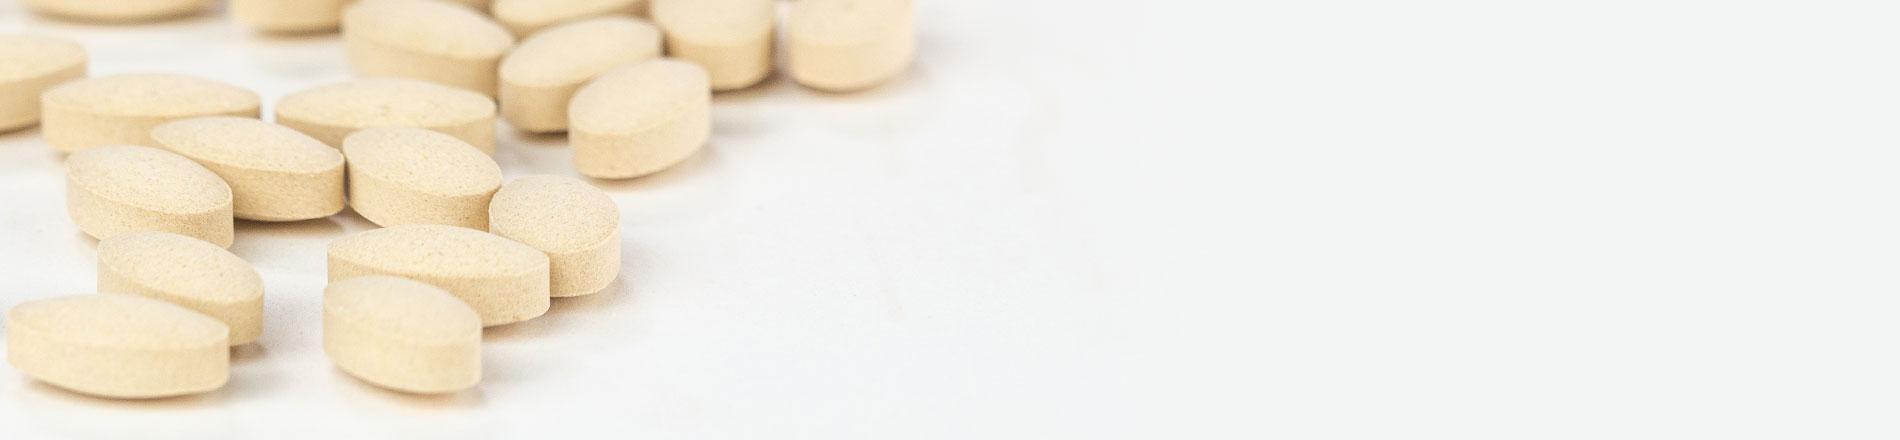 Shatavari tablets